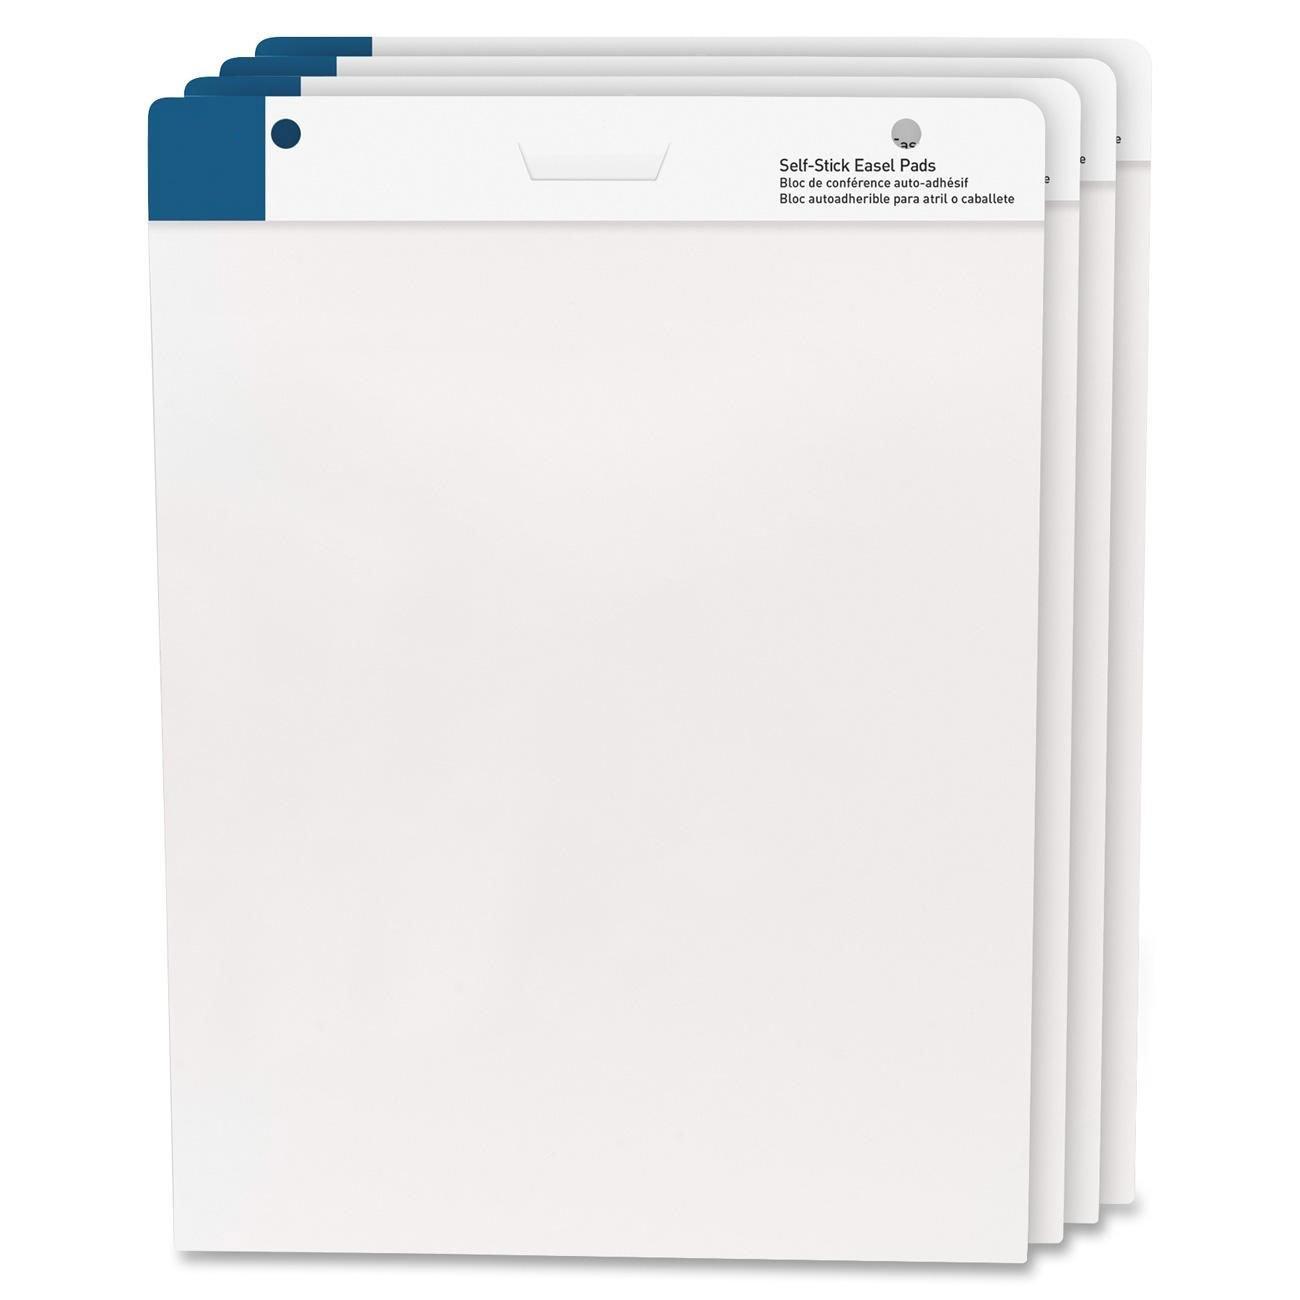 MyOfficeInnovations 3254370 Self-Stick Easel Pads 25''x30'' 30 Shts/Pad 4/PK White